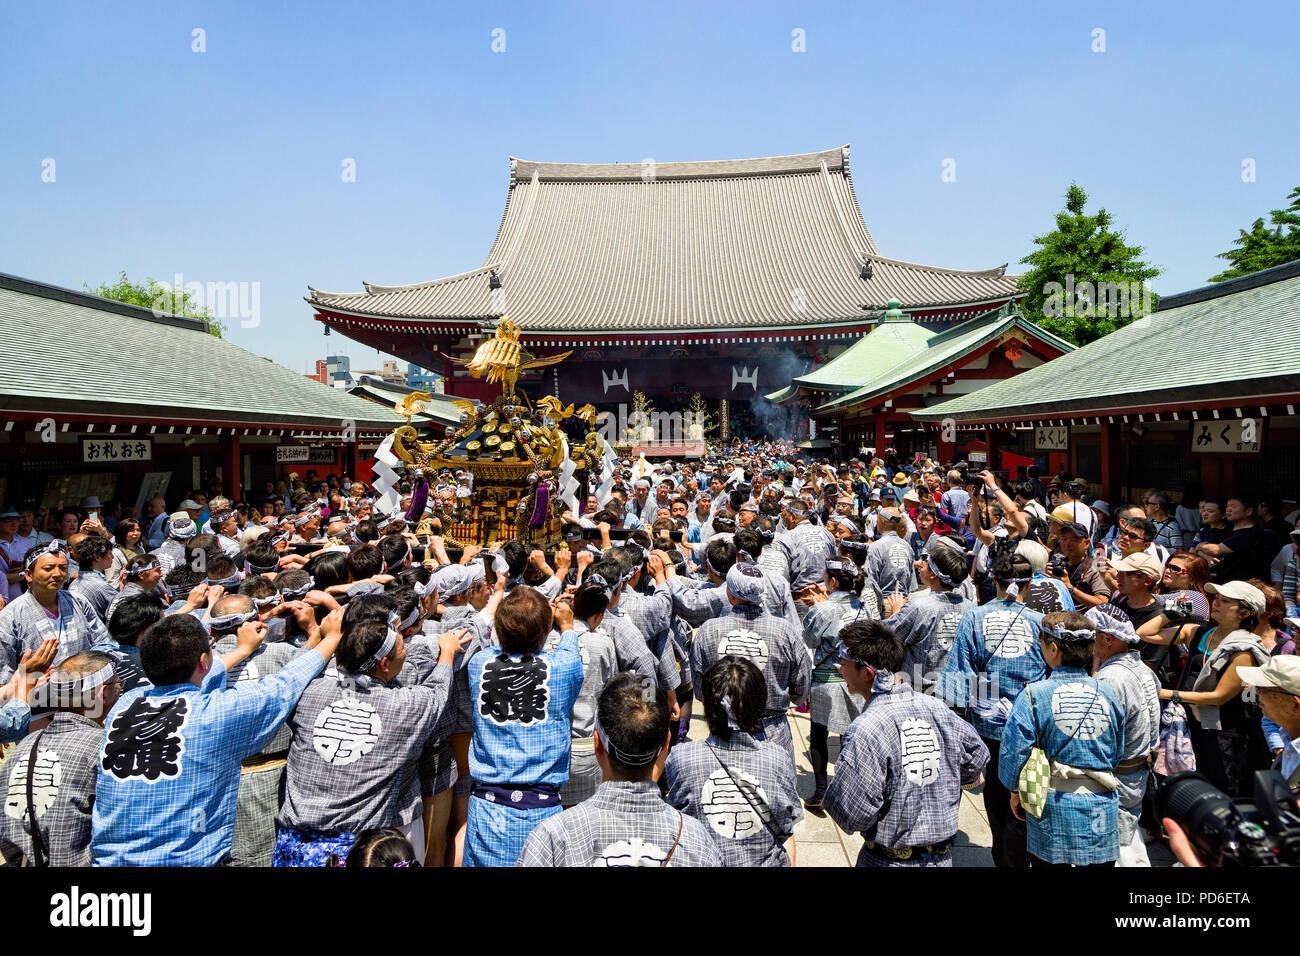 Japan, Honshu island, Kanto, Tokyo, the Sanja matsuri. - Stock Image